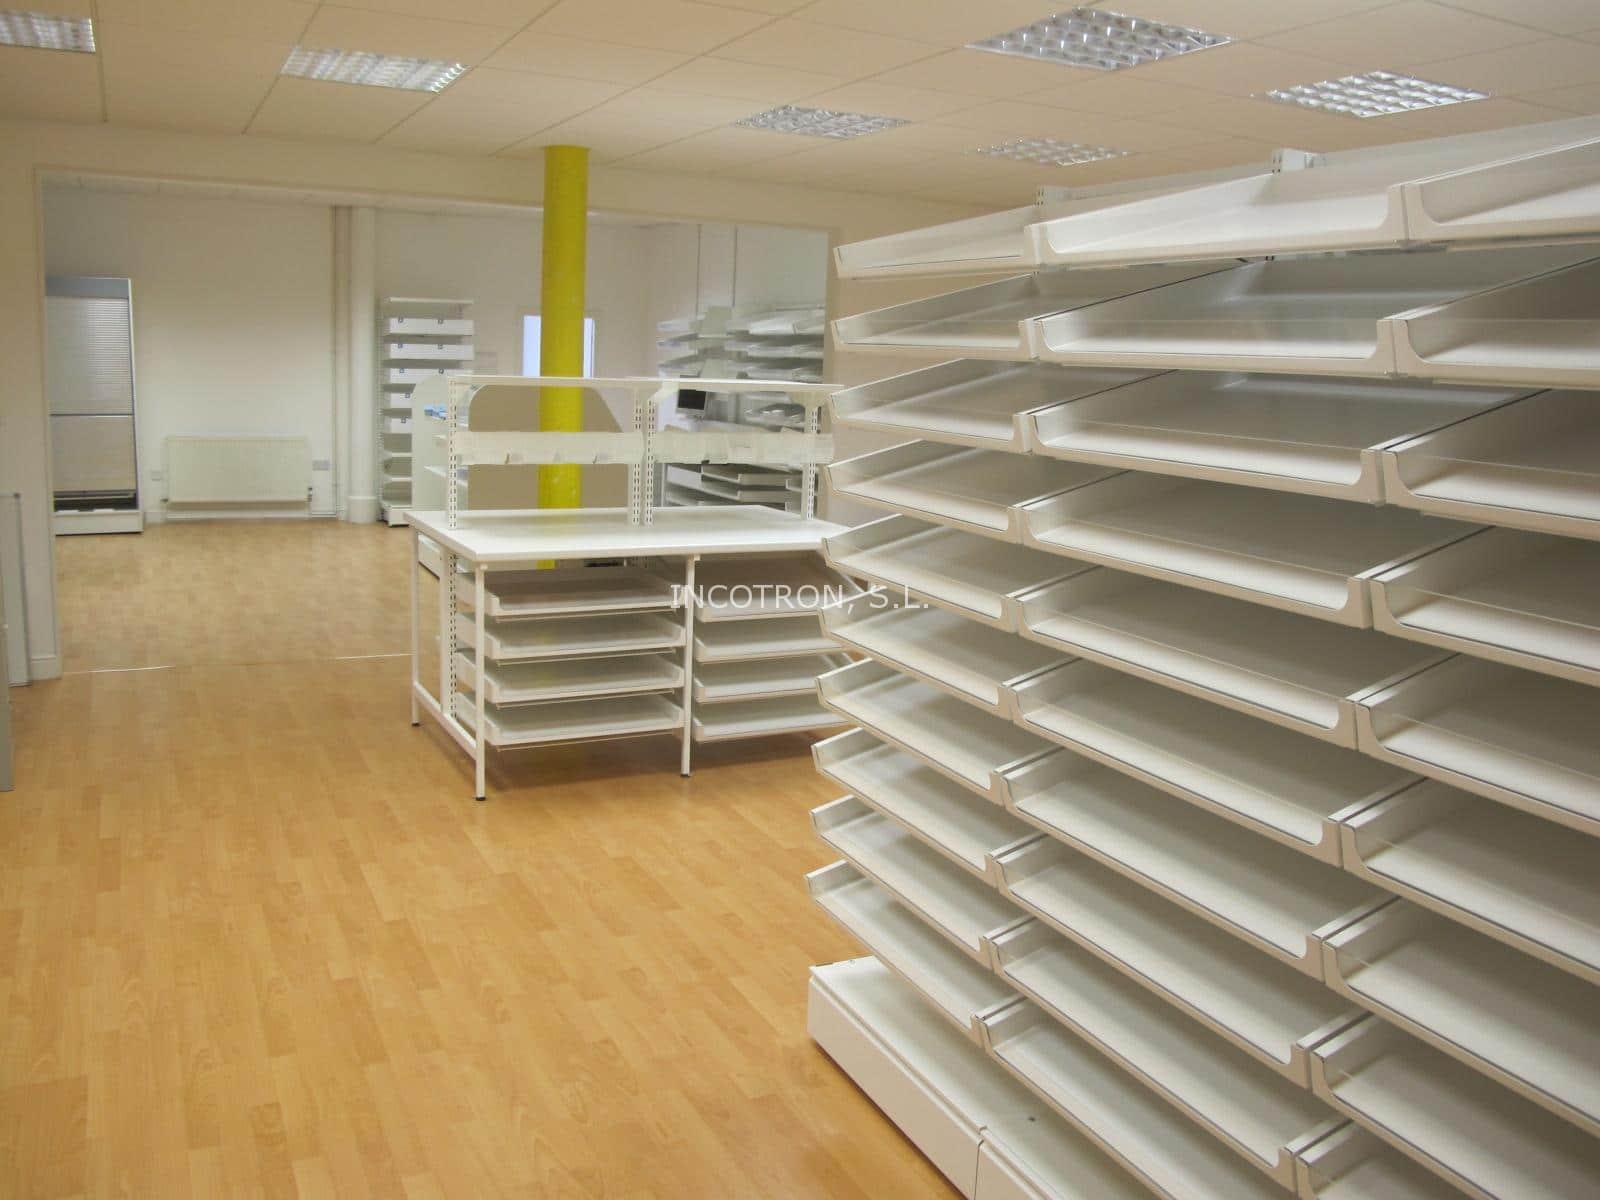 Mobiliario para almacenaje en farmacia hospitalaria